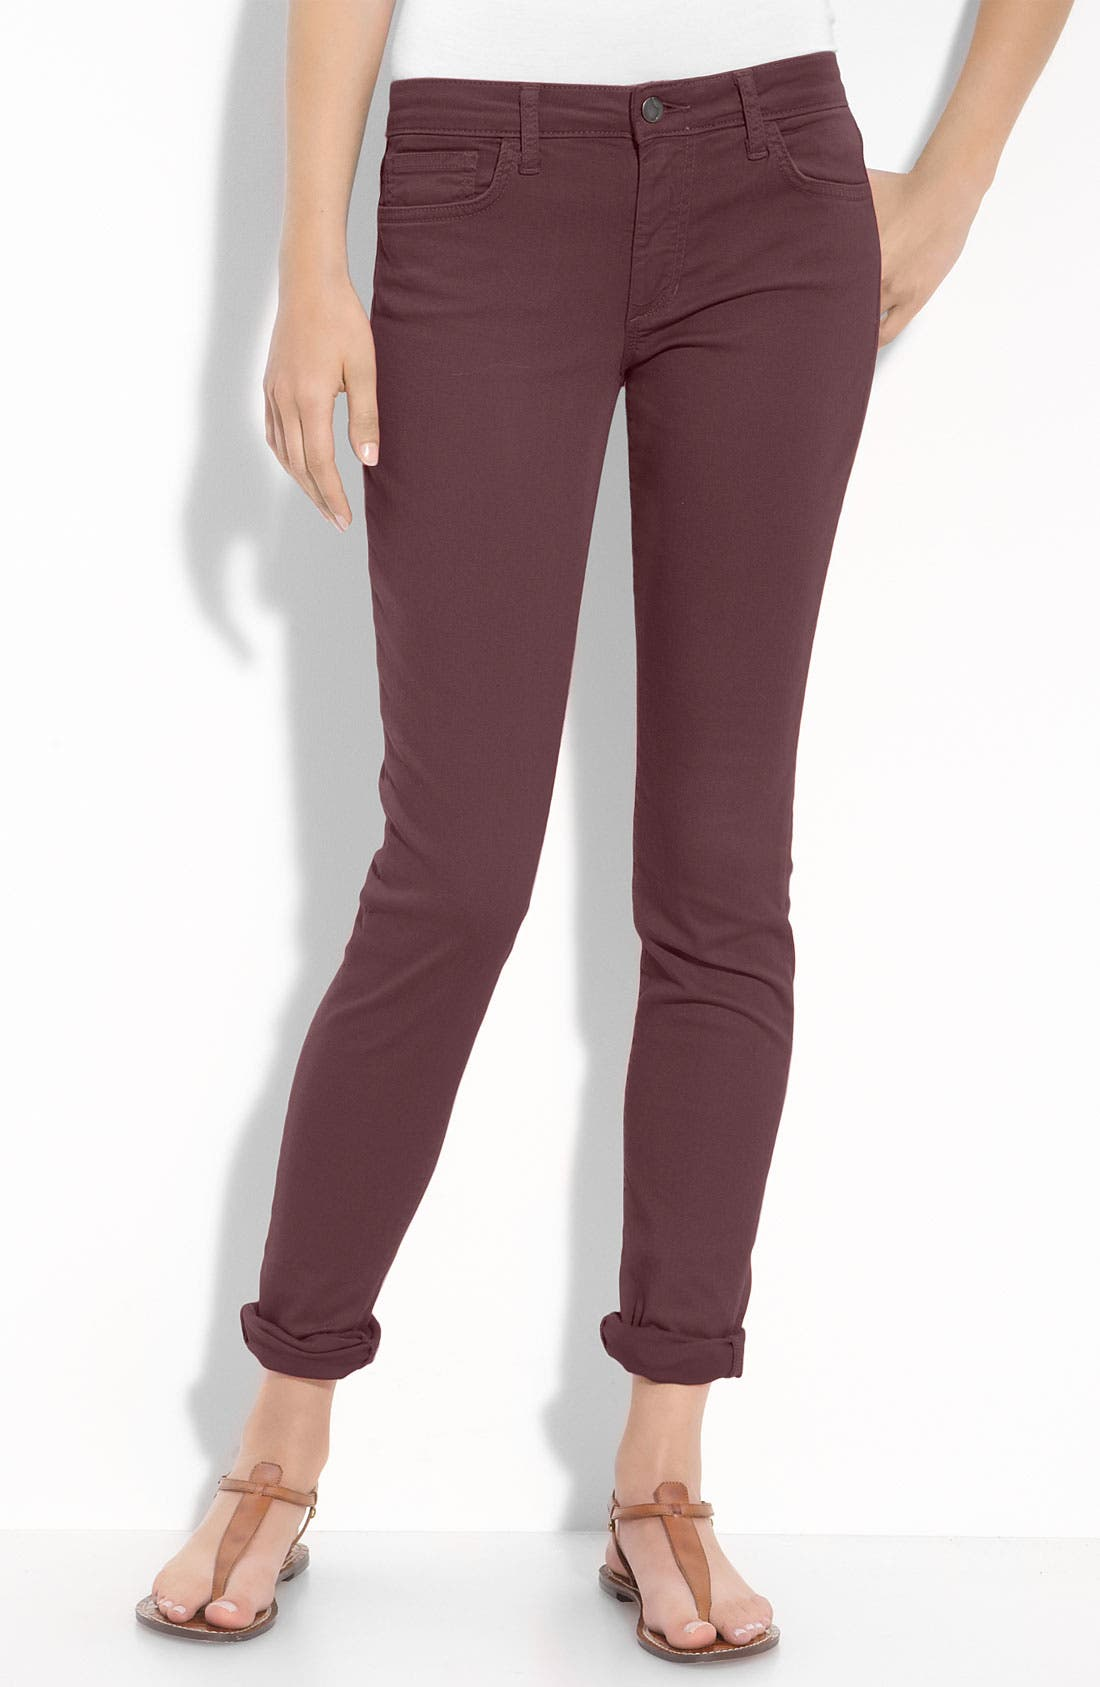 JOE'S 'Chelsea' Skinny Stretch Denim Jeans, Main, color, 200